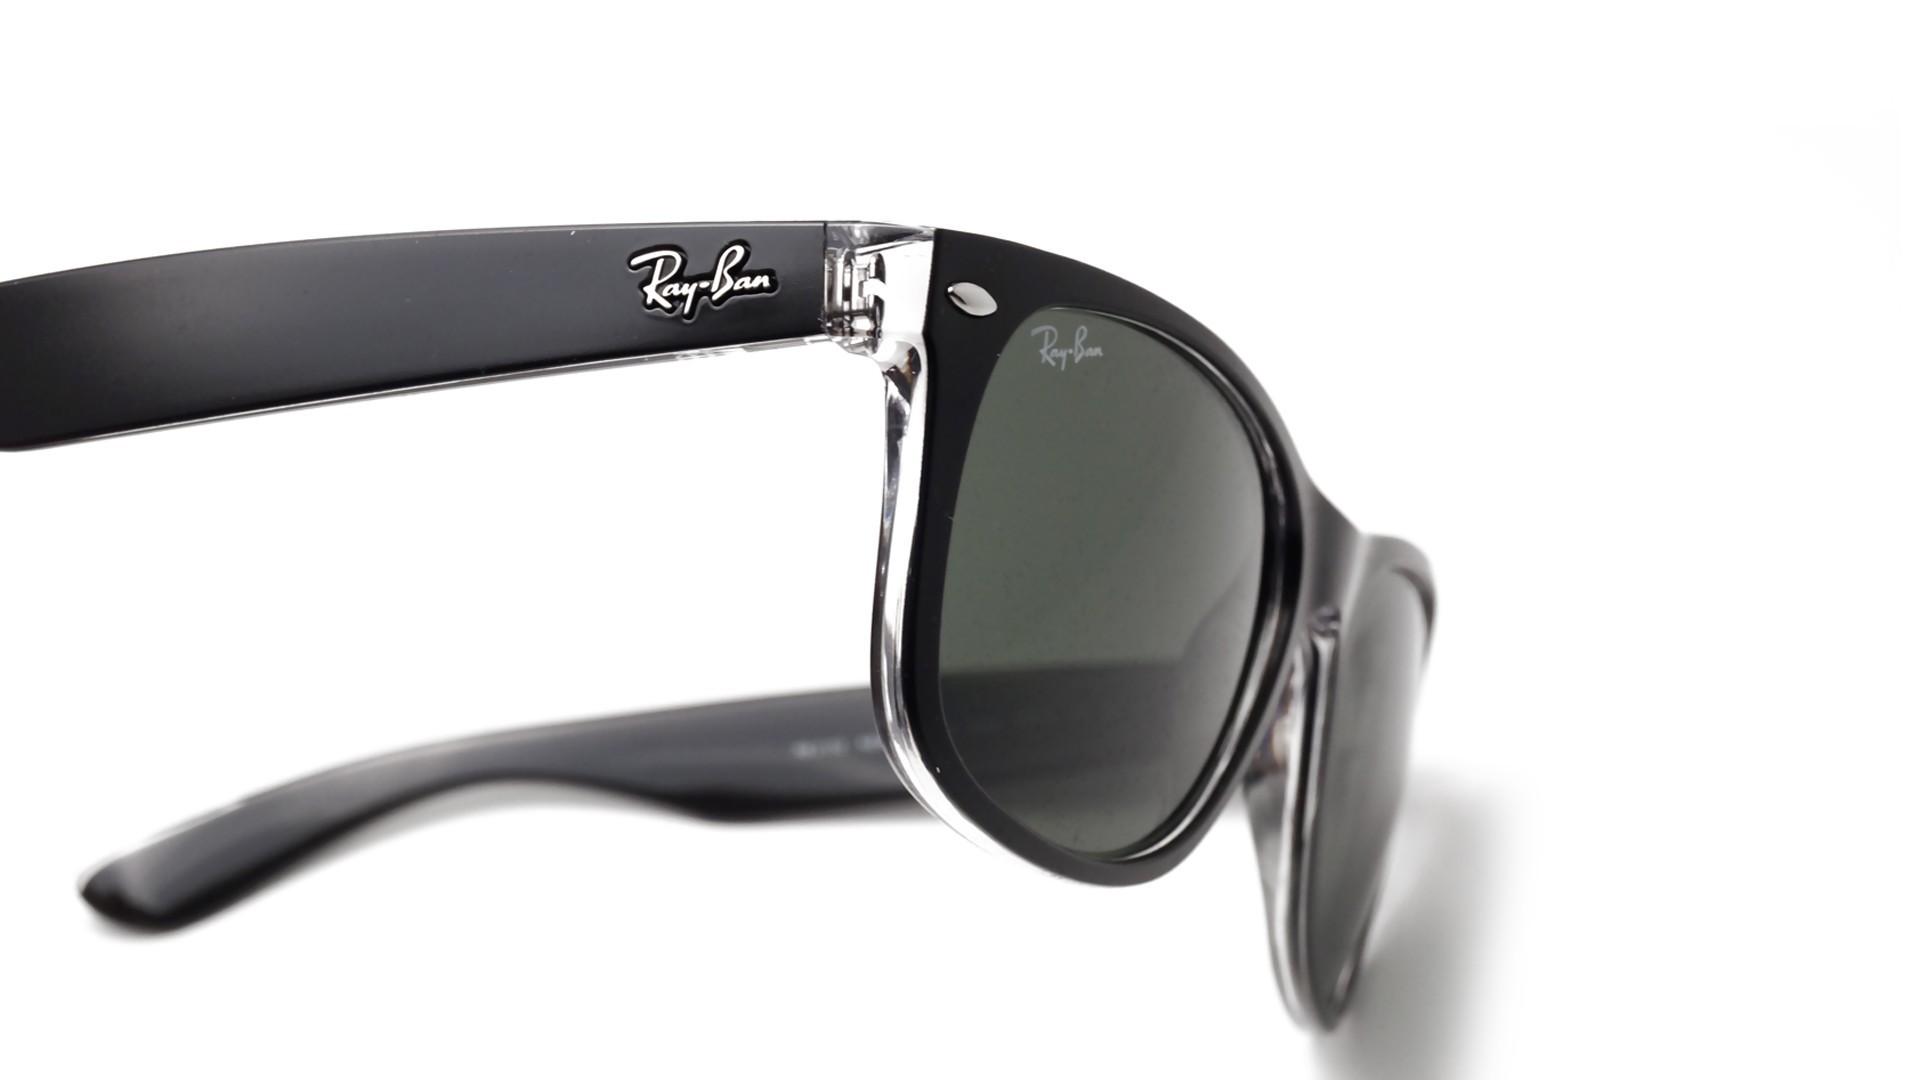 bae100fc4ca46 Sunglasses Ray-Ban New Wayfarer Black RB2132 6052 52-18 Medium